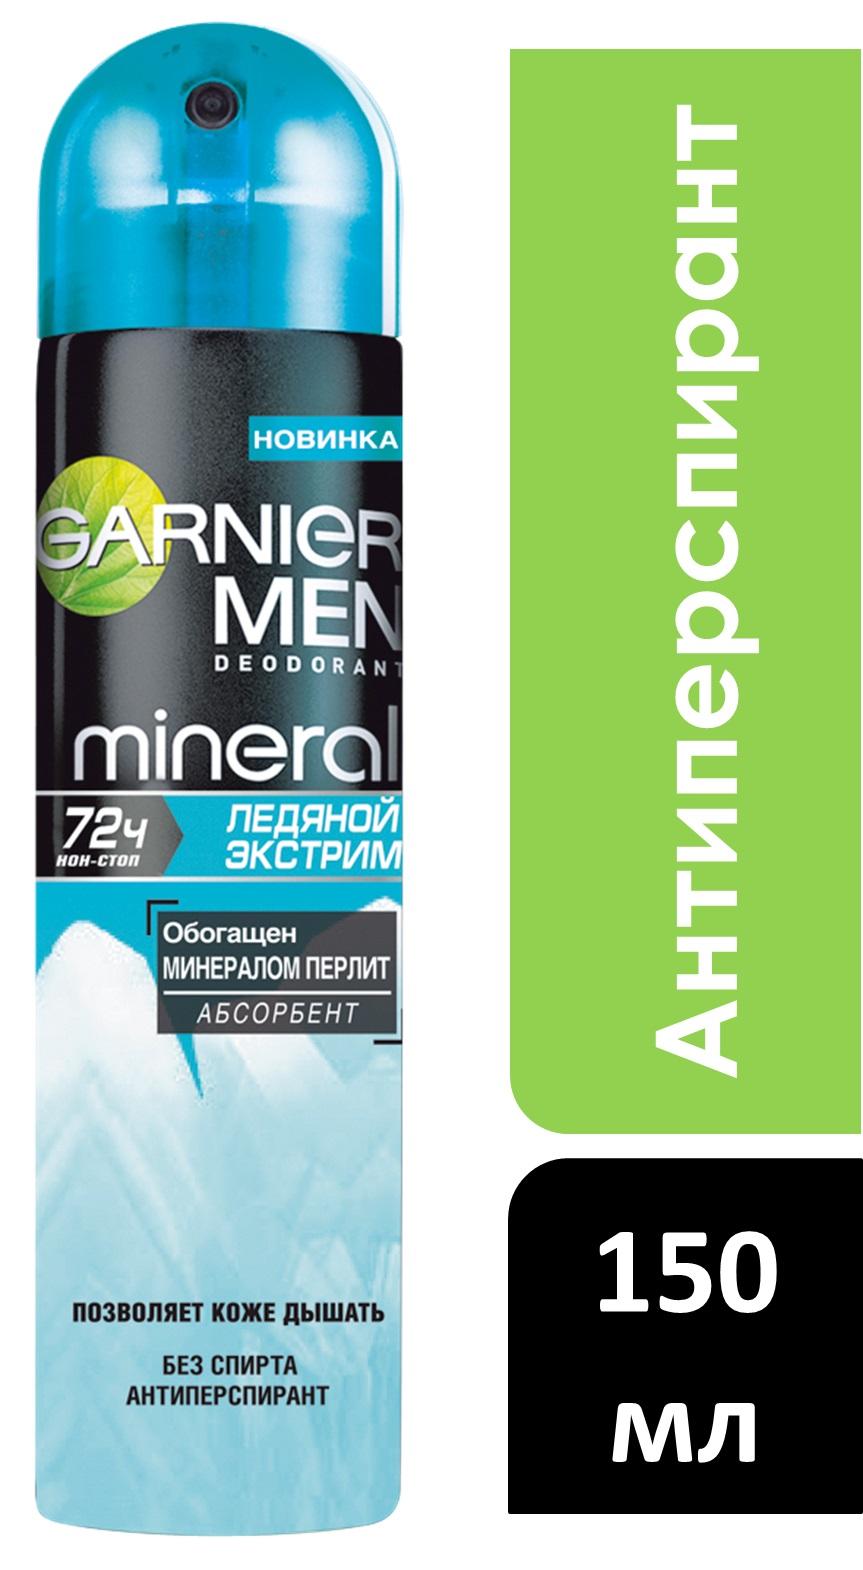 "Garnier Дезодорант-антиперспирант спрей ""Mineral, Ледяной экстрим"", защита 72 часа, мужской, 150 мл"